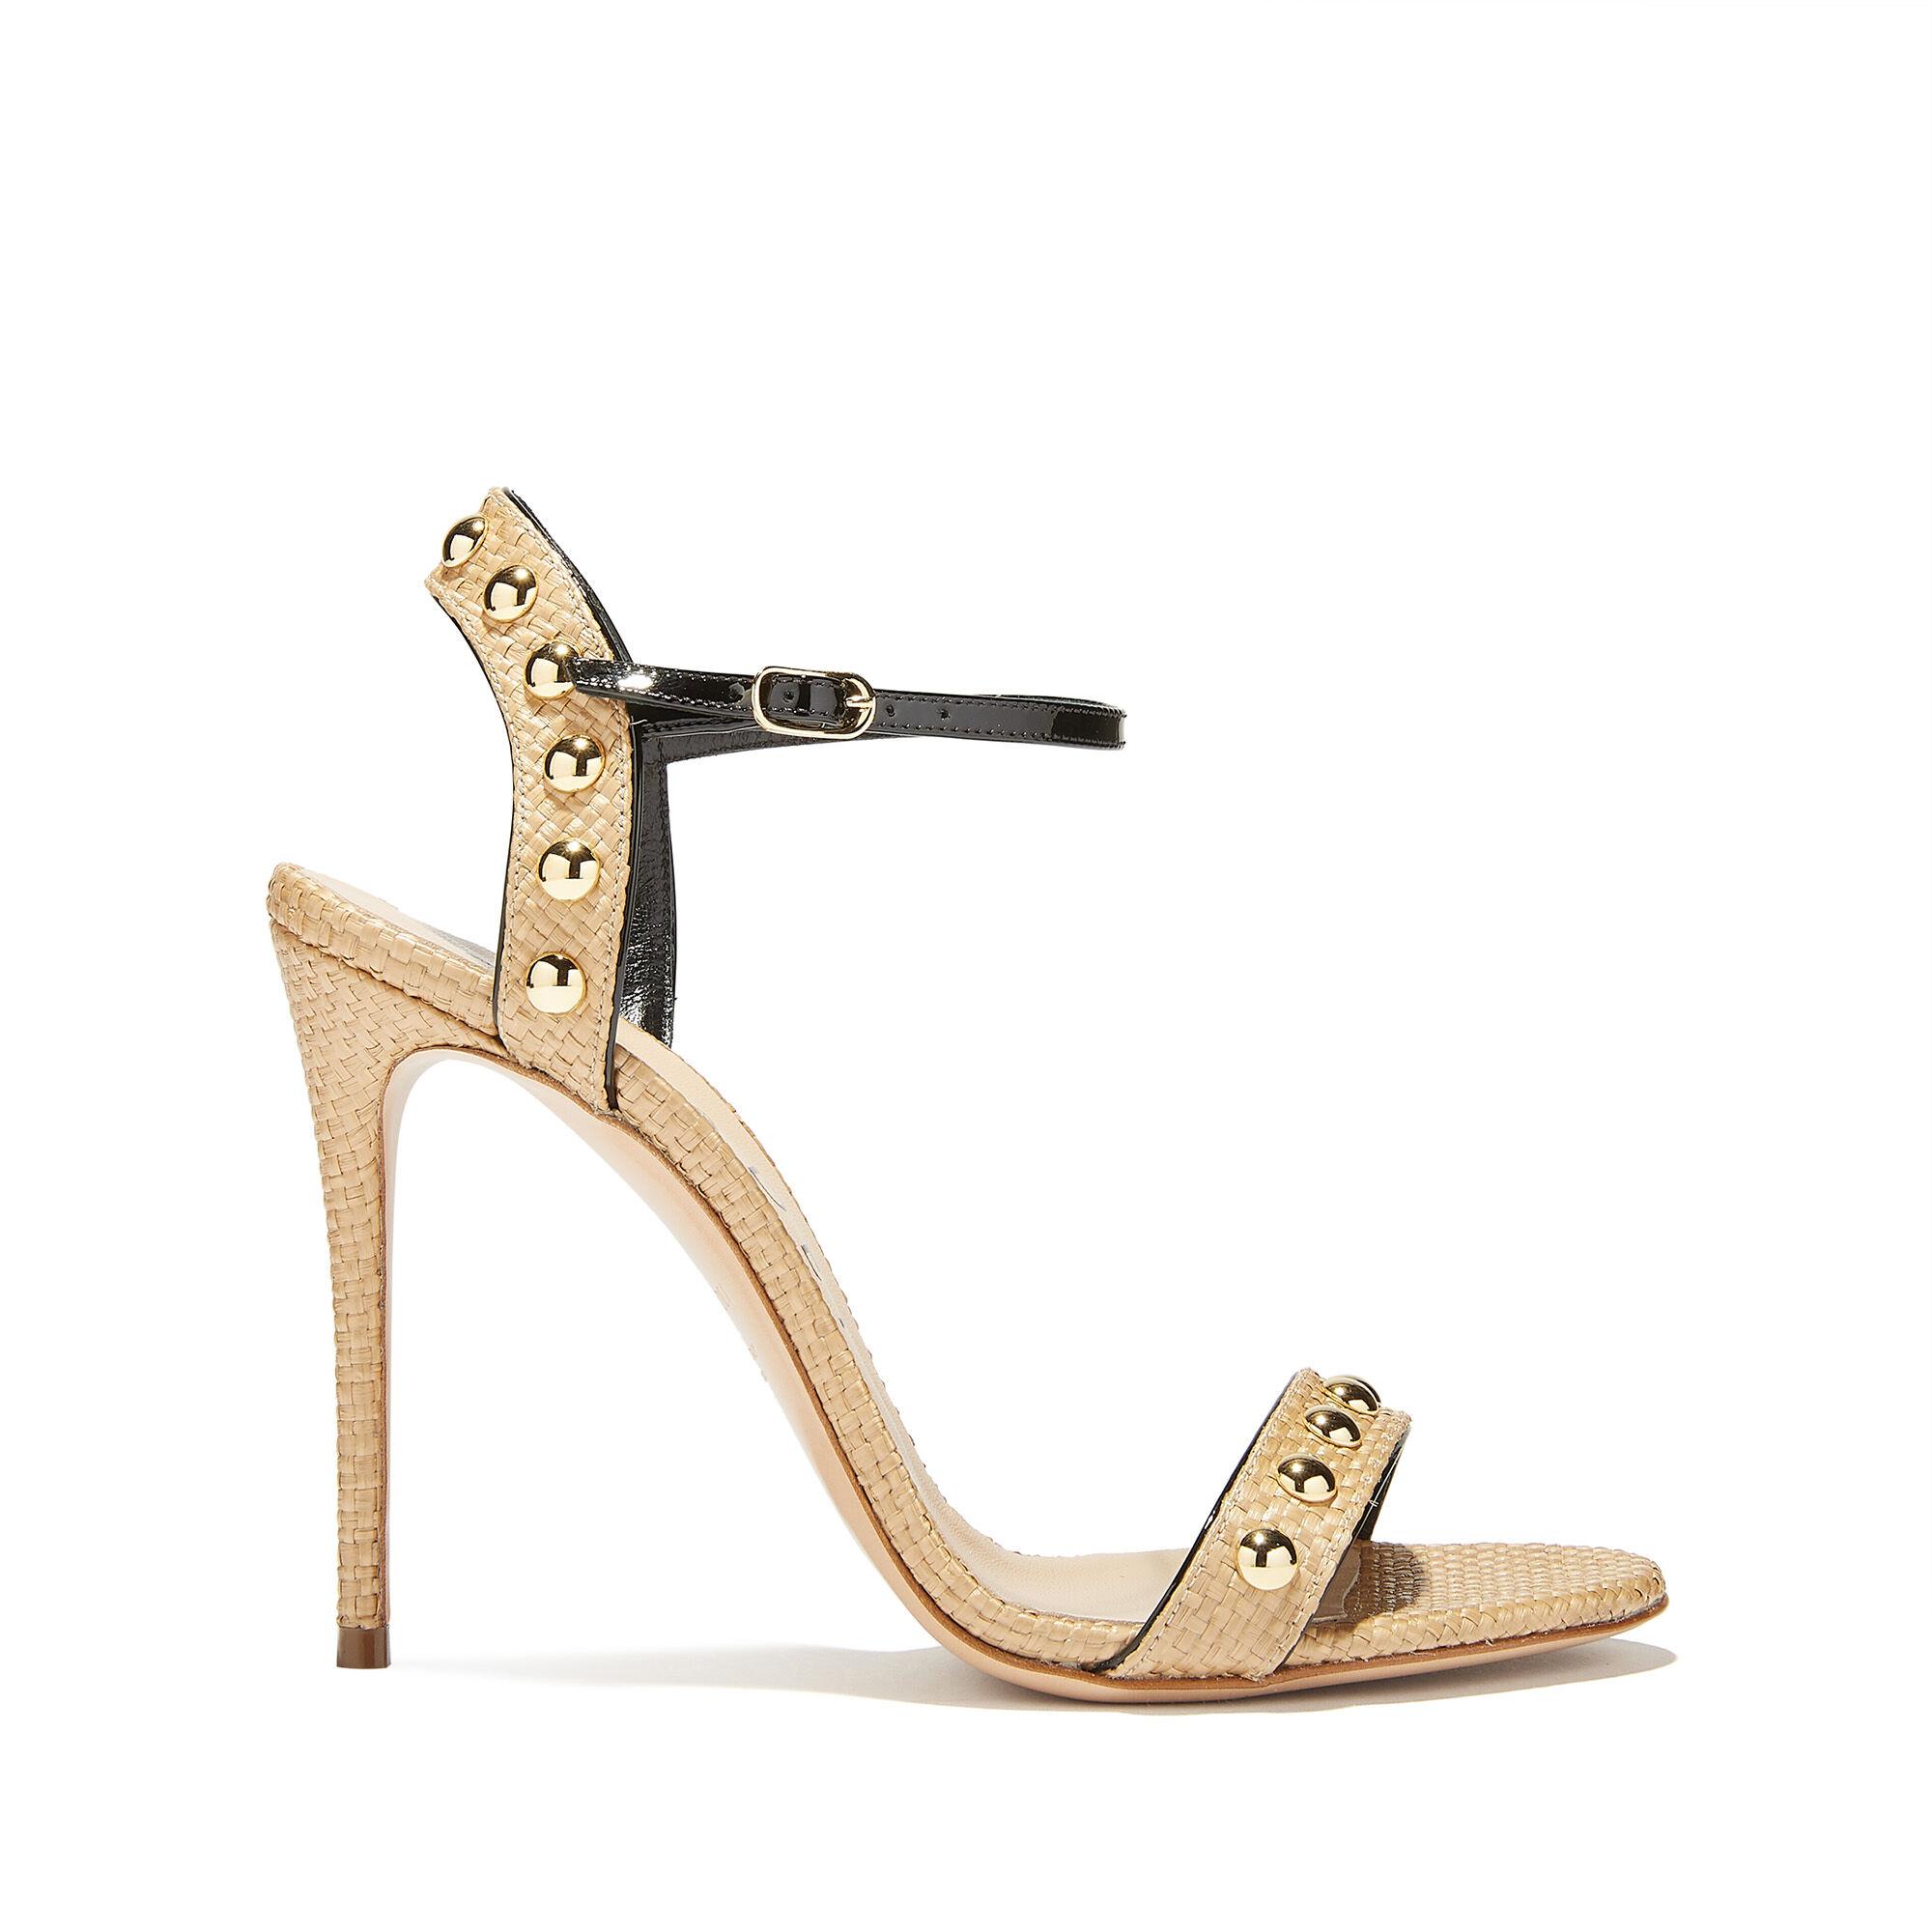 Casadei Sale Sandals | SS 19 | Casadei